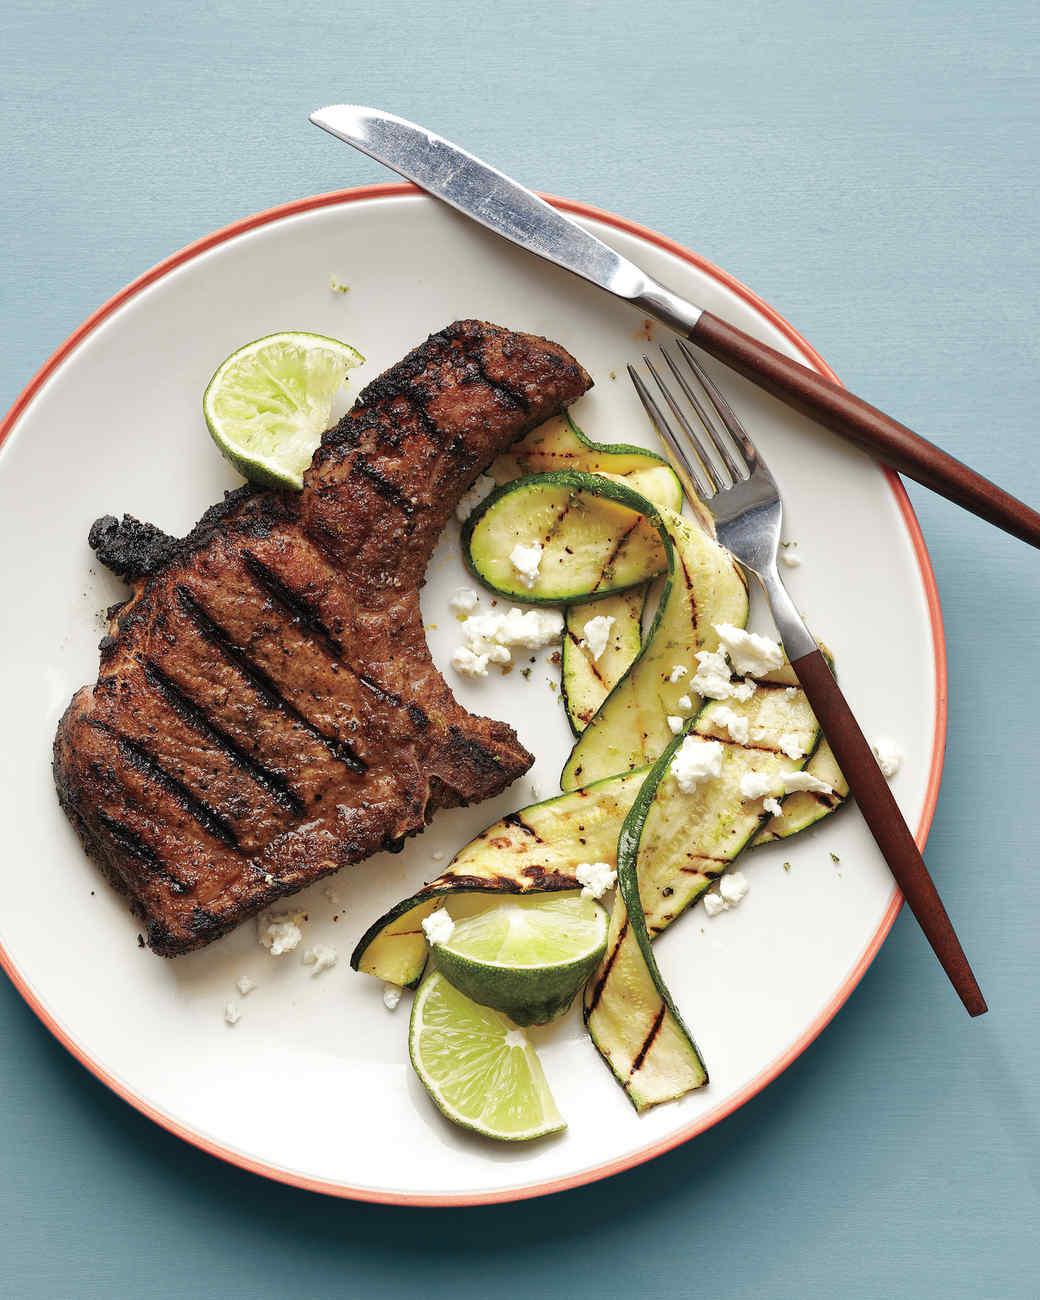 pork-chop-zucchini-med108462.jpg